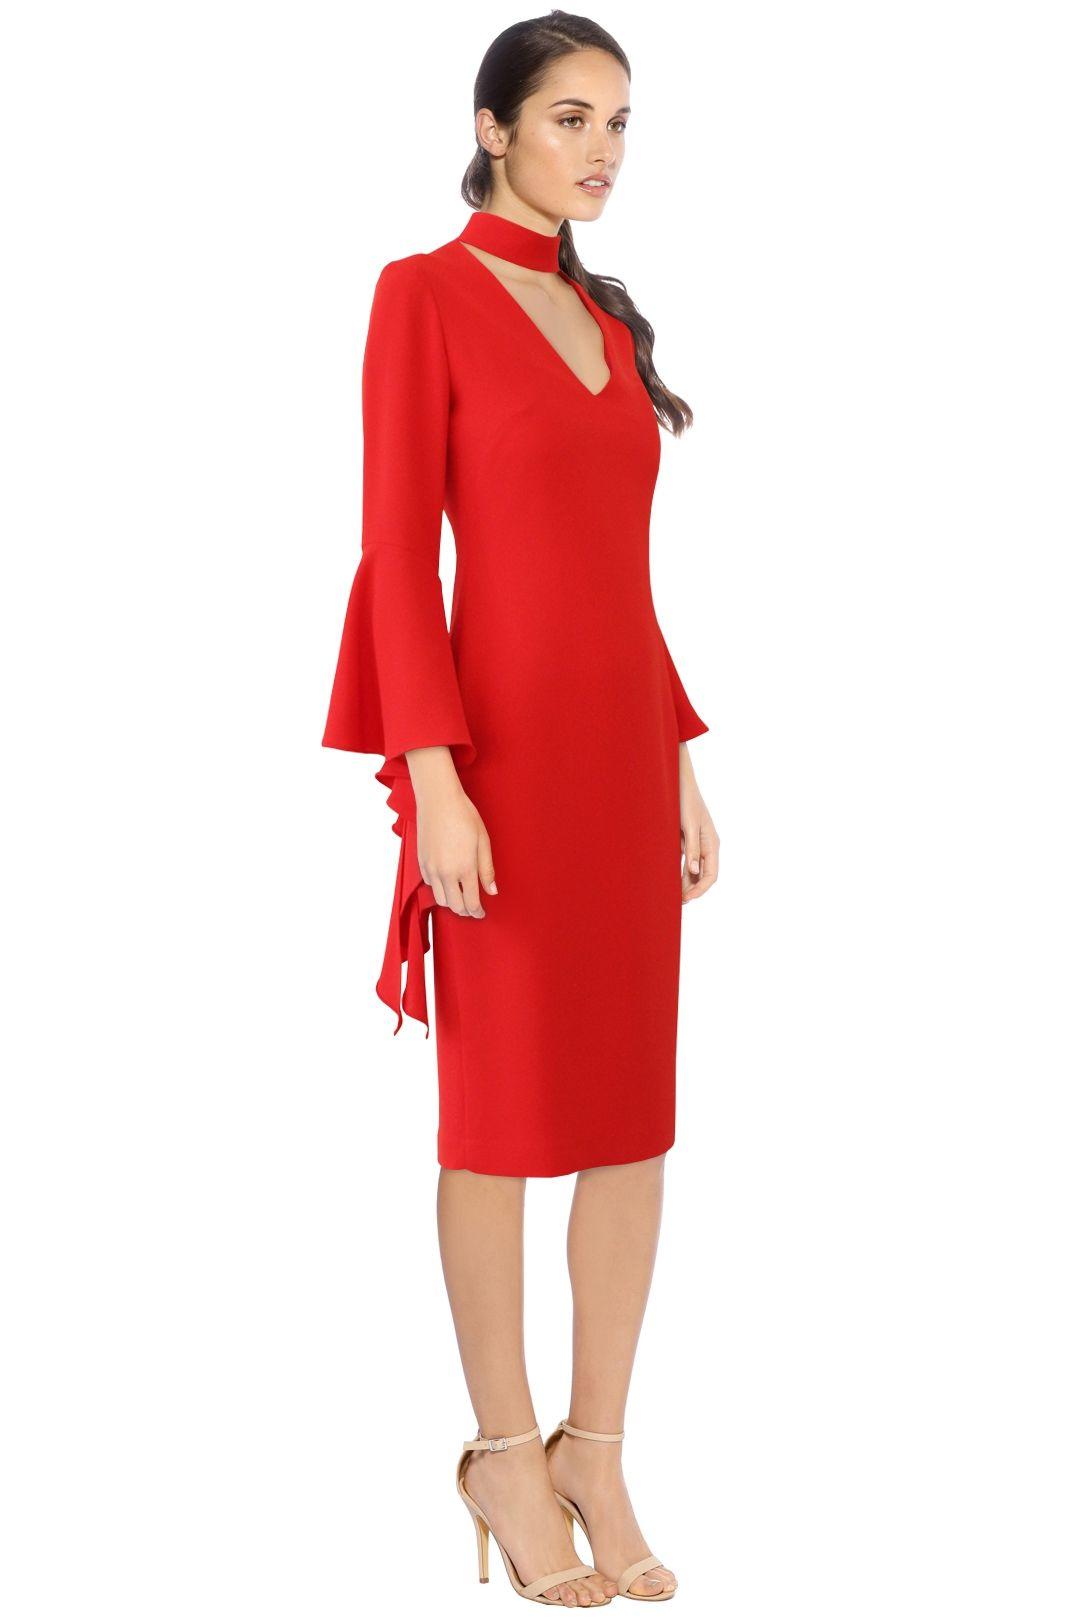 Carla Zampatti - Senorina Dress - Red - Side